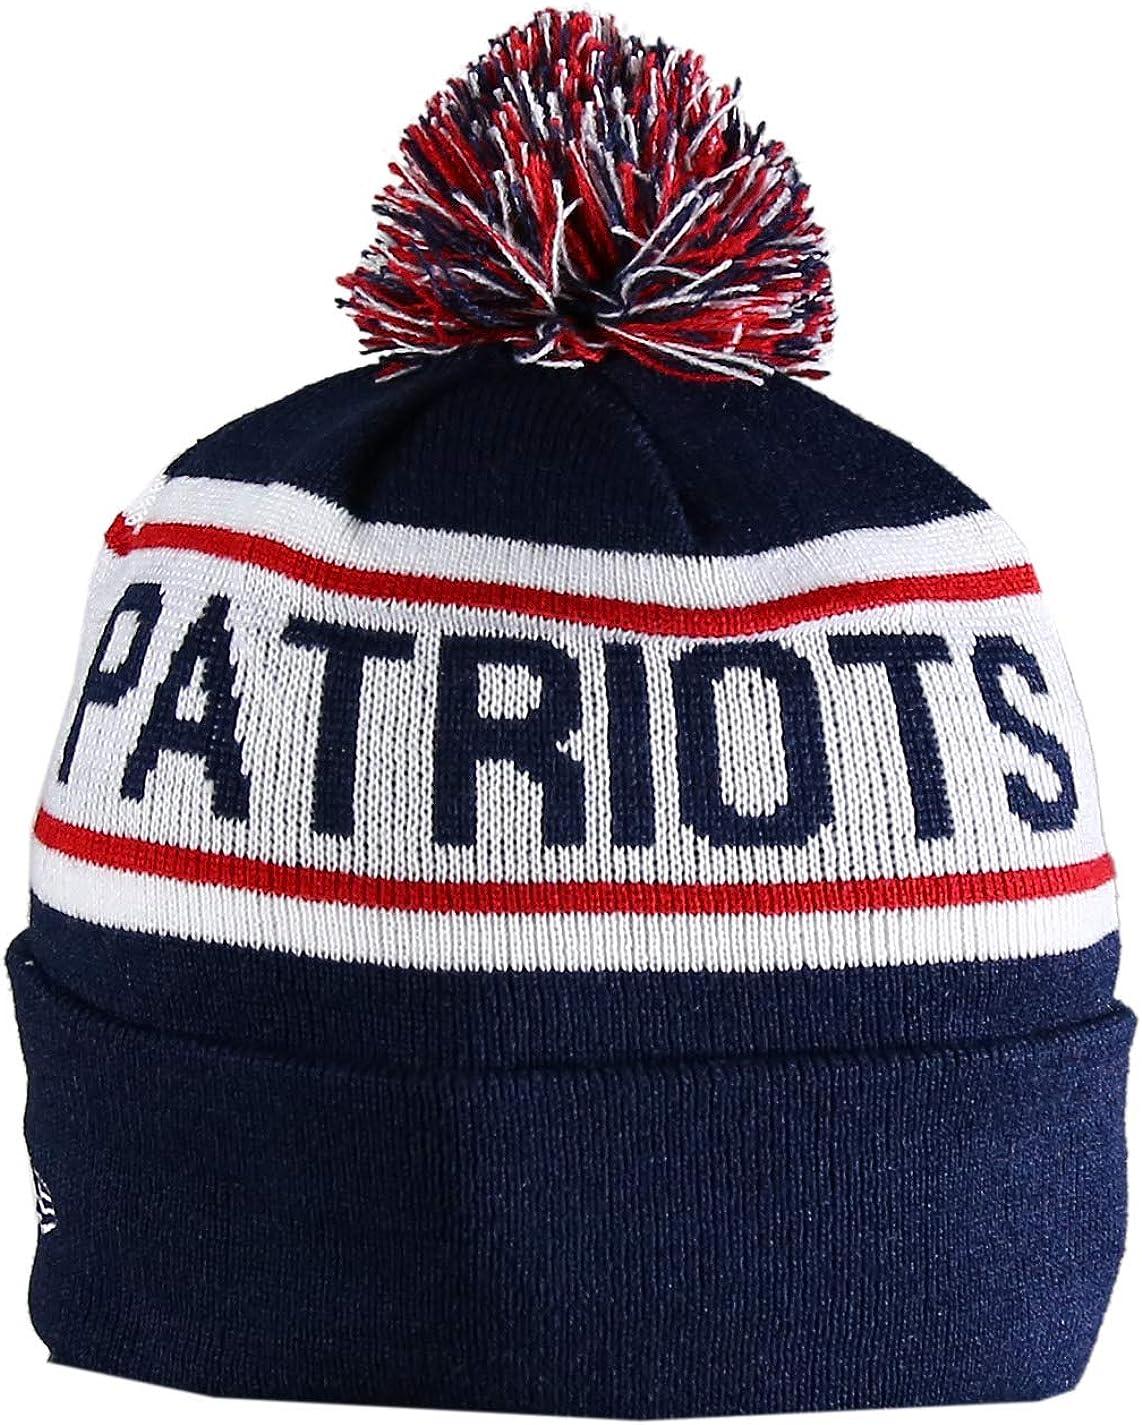 NE PATRIOTS Sport Knit Winter Wool Warm Beanie Hat Multicolour